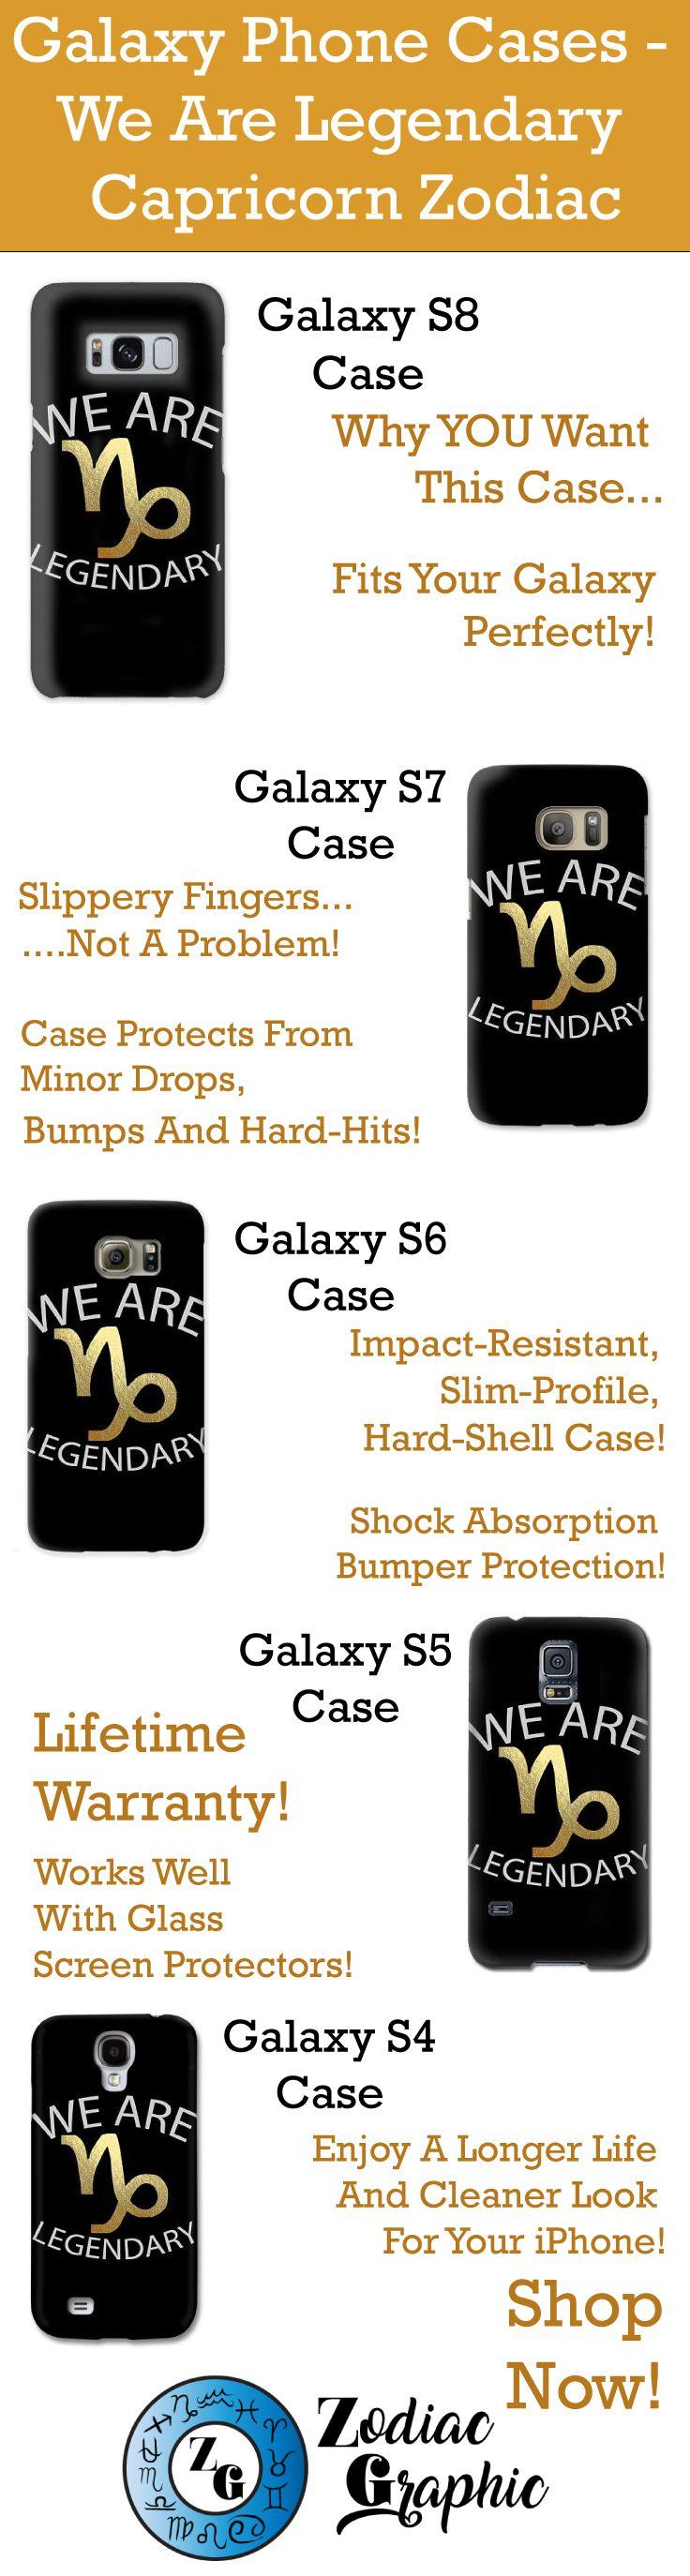 Galaxy S8 || Galaxy S7 || Galaxy S6 || Galaxy S5 || Galaxy S4 || We Are Legendary Capricorn - Phone Case || Zodiac || Zodiac Sign || Zodiac Gift || Capricorn || Capricorn Zodiac Gift || Gift For Capricorn || December Birthday Gift || January Birthday Gift